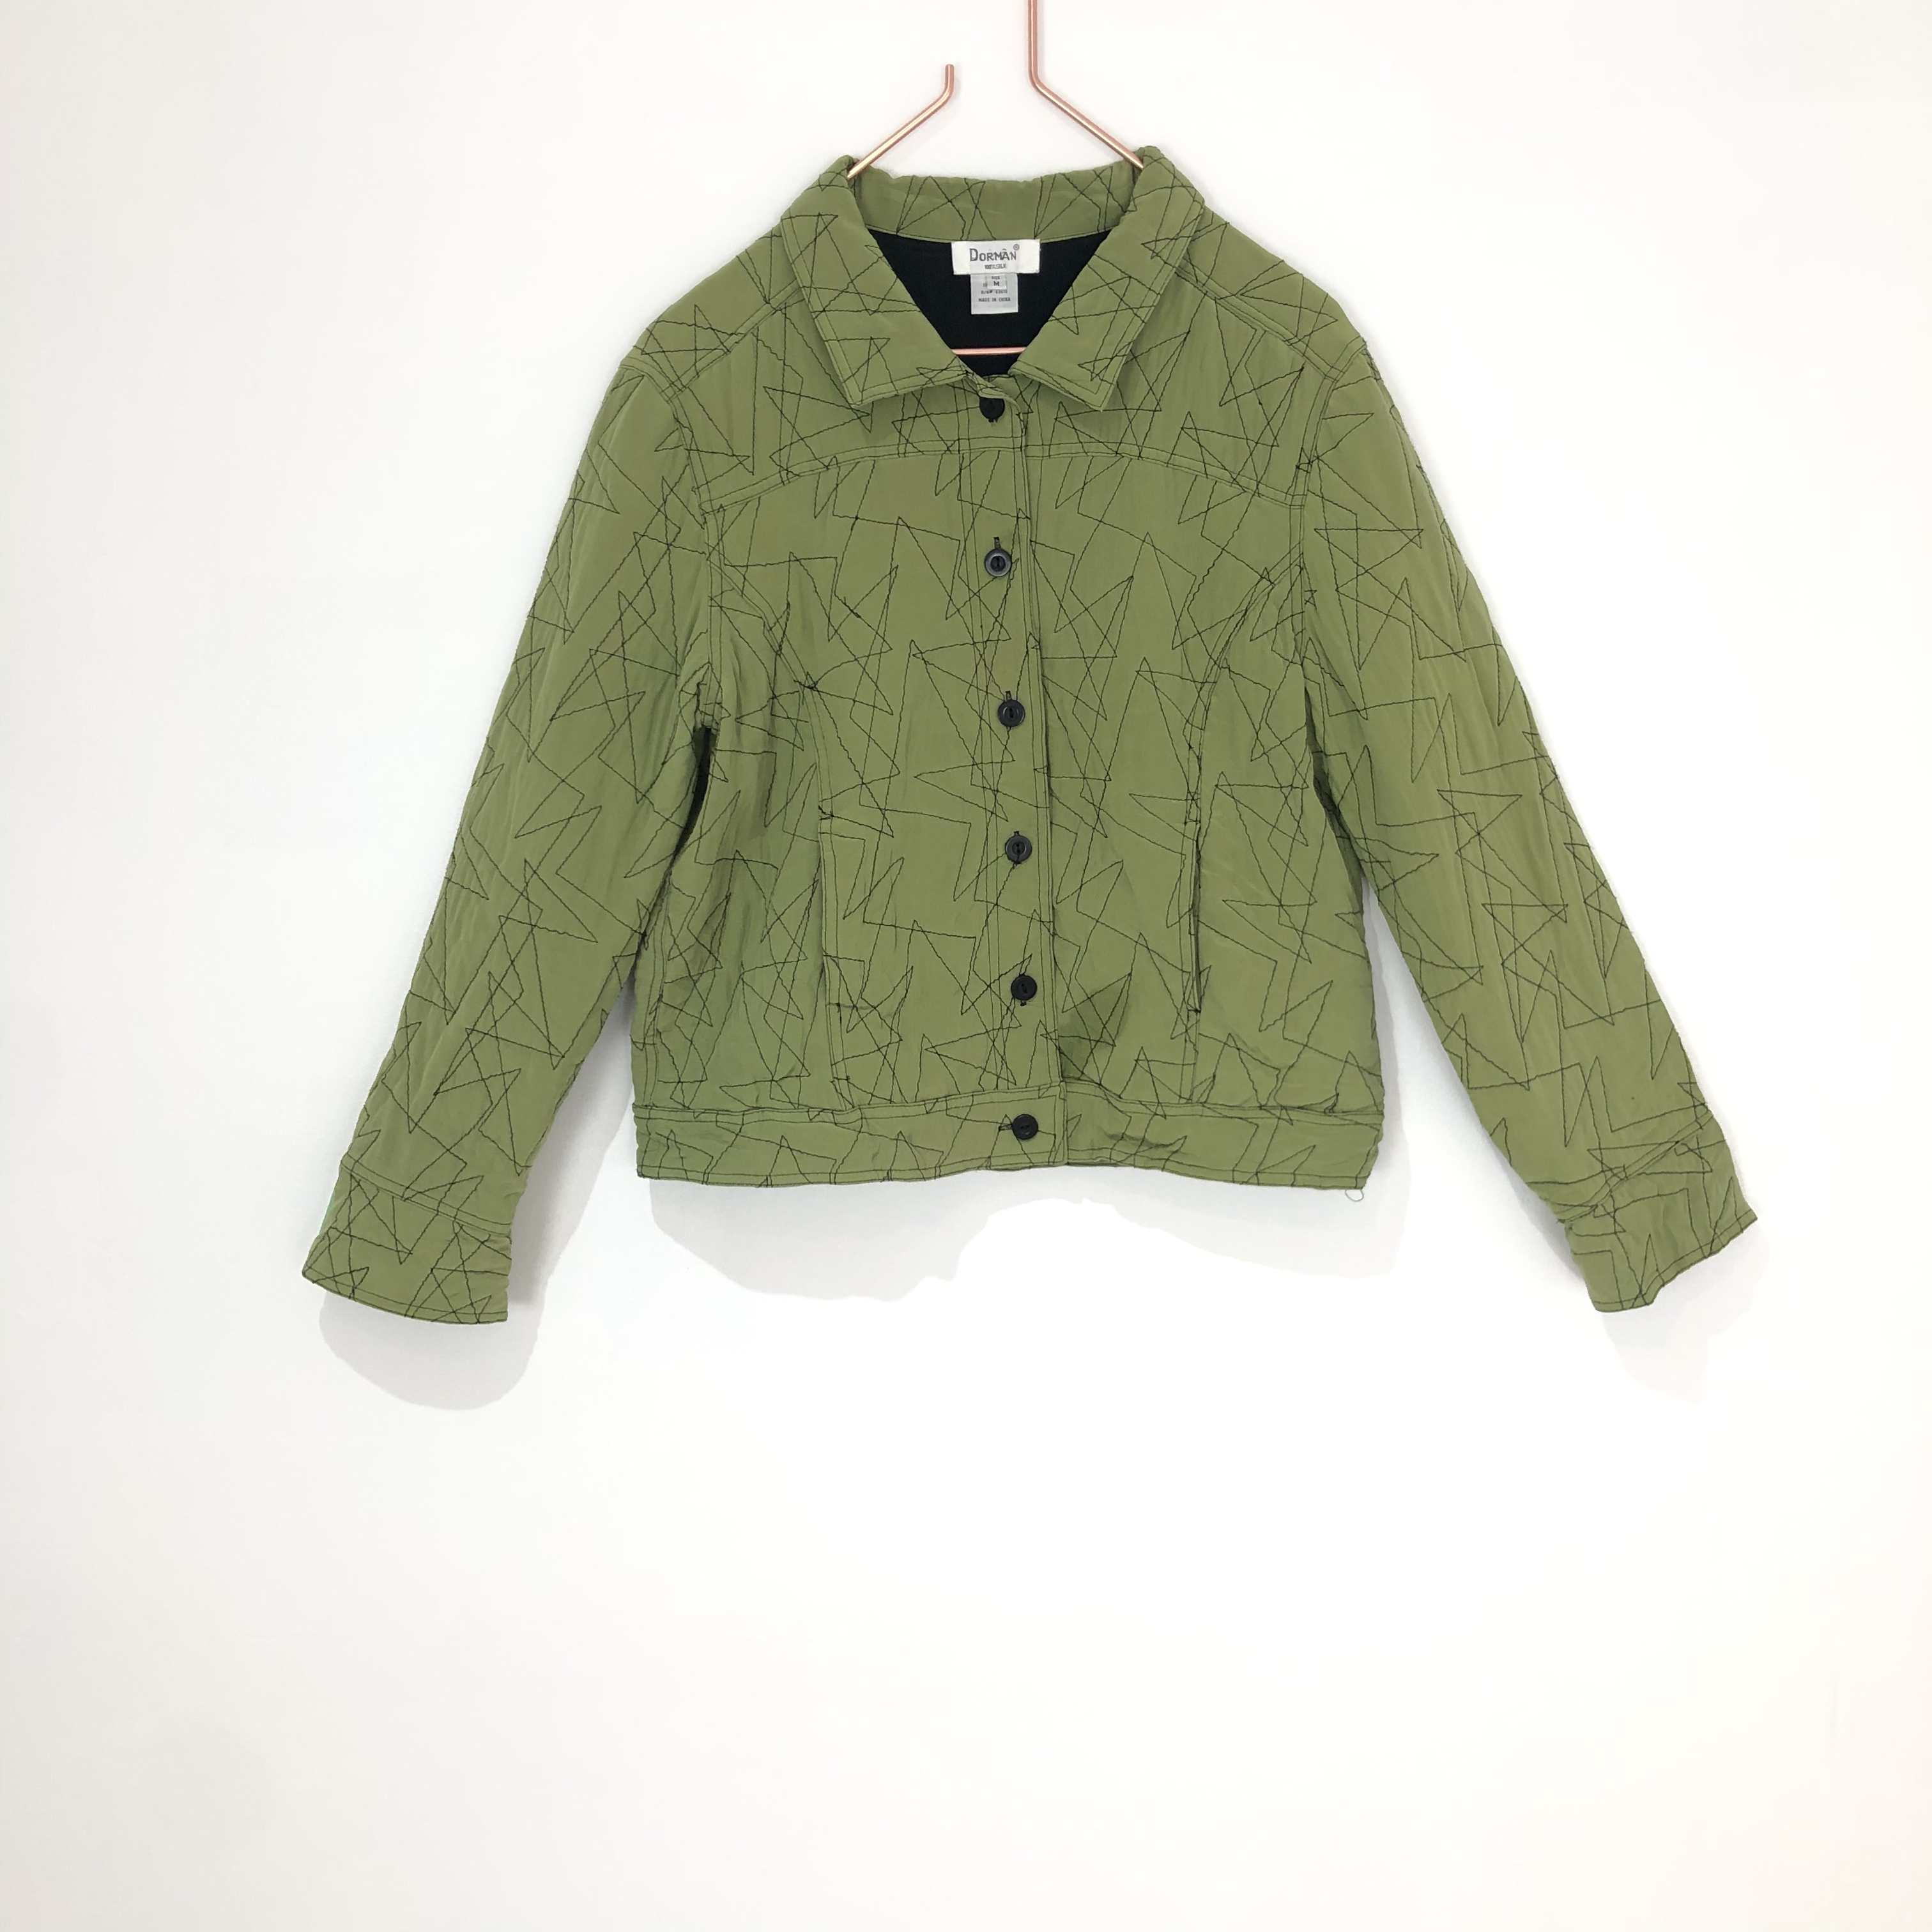 ◼︎90s random stitch silk jacket from U.S.A.◼︎